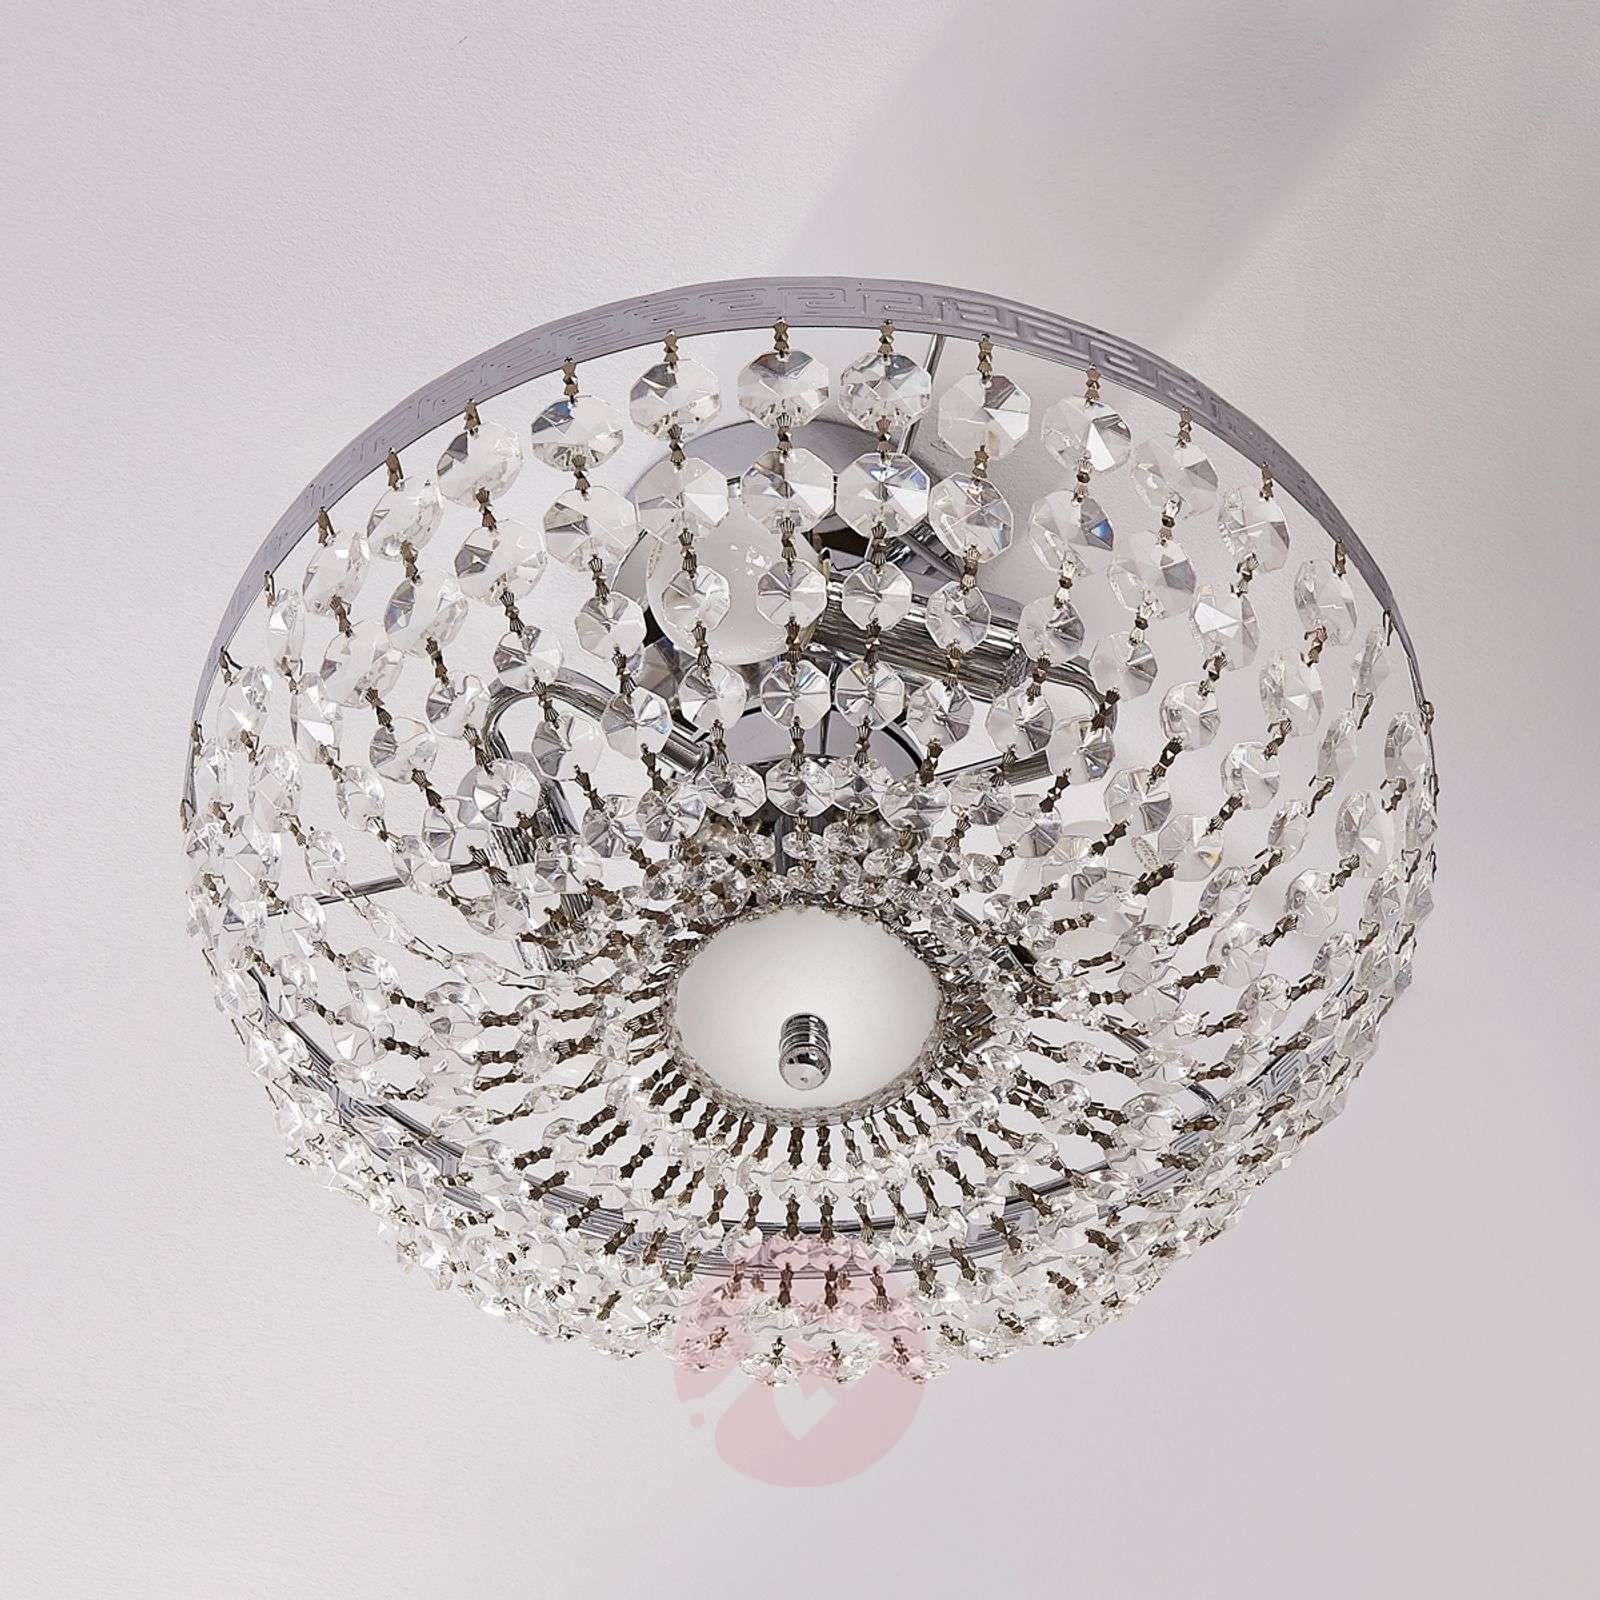 Sparkling crystal ceiling light Mondrian-9620693-010